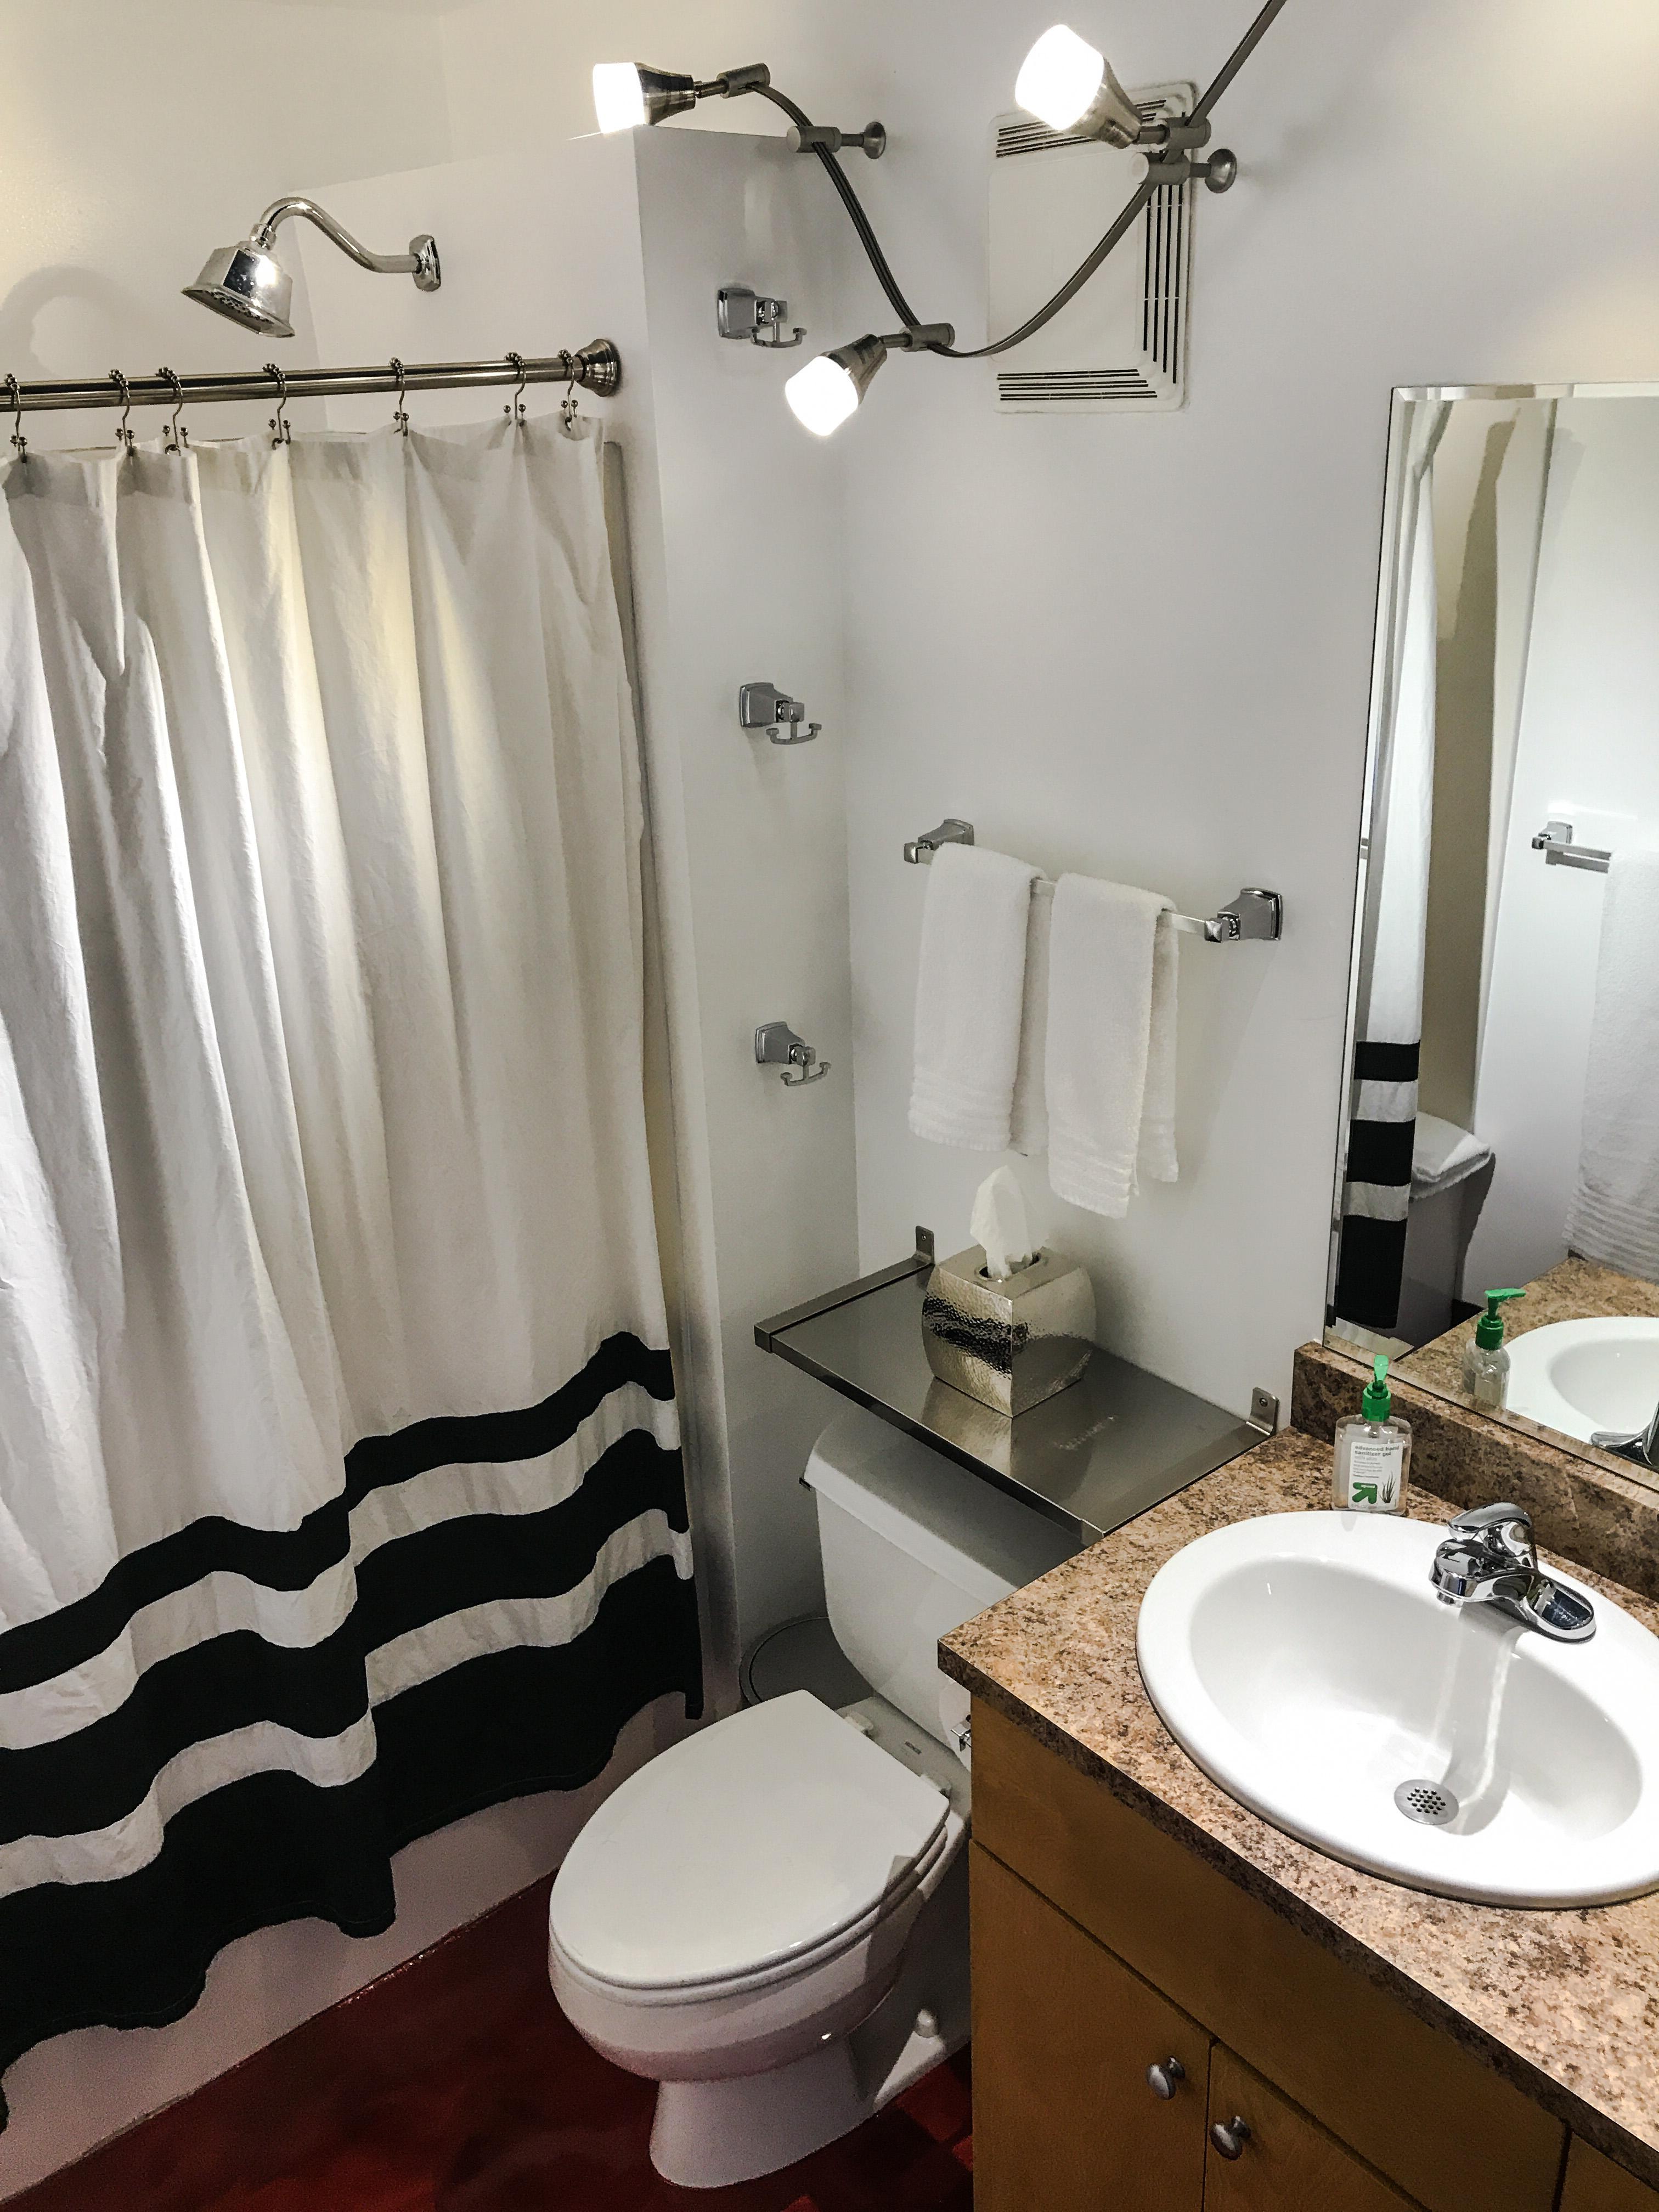 Loft Reverie Hotel 809 - Bathroom + Amenities  + Shower + Tissue + Towels